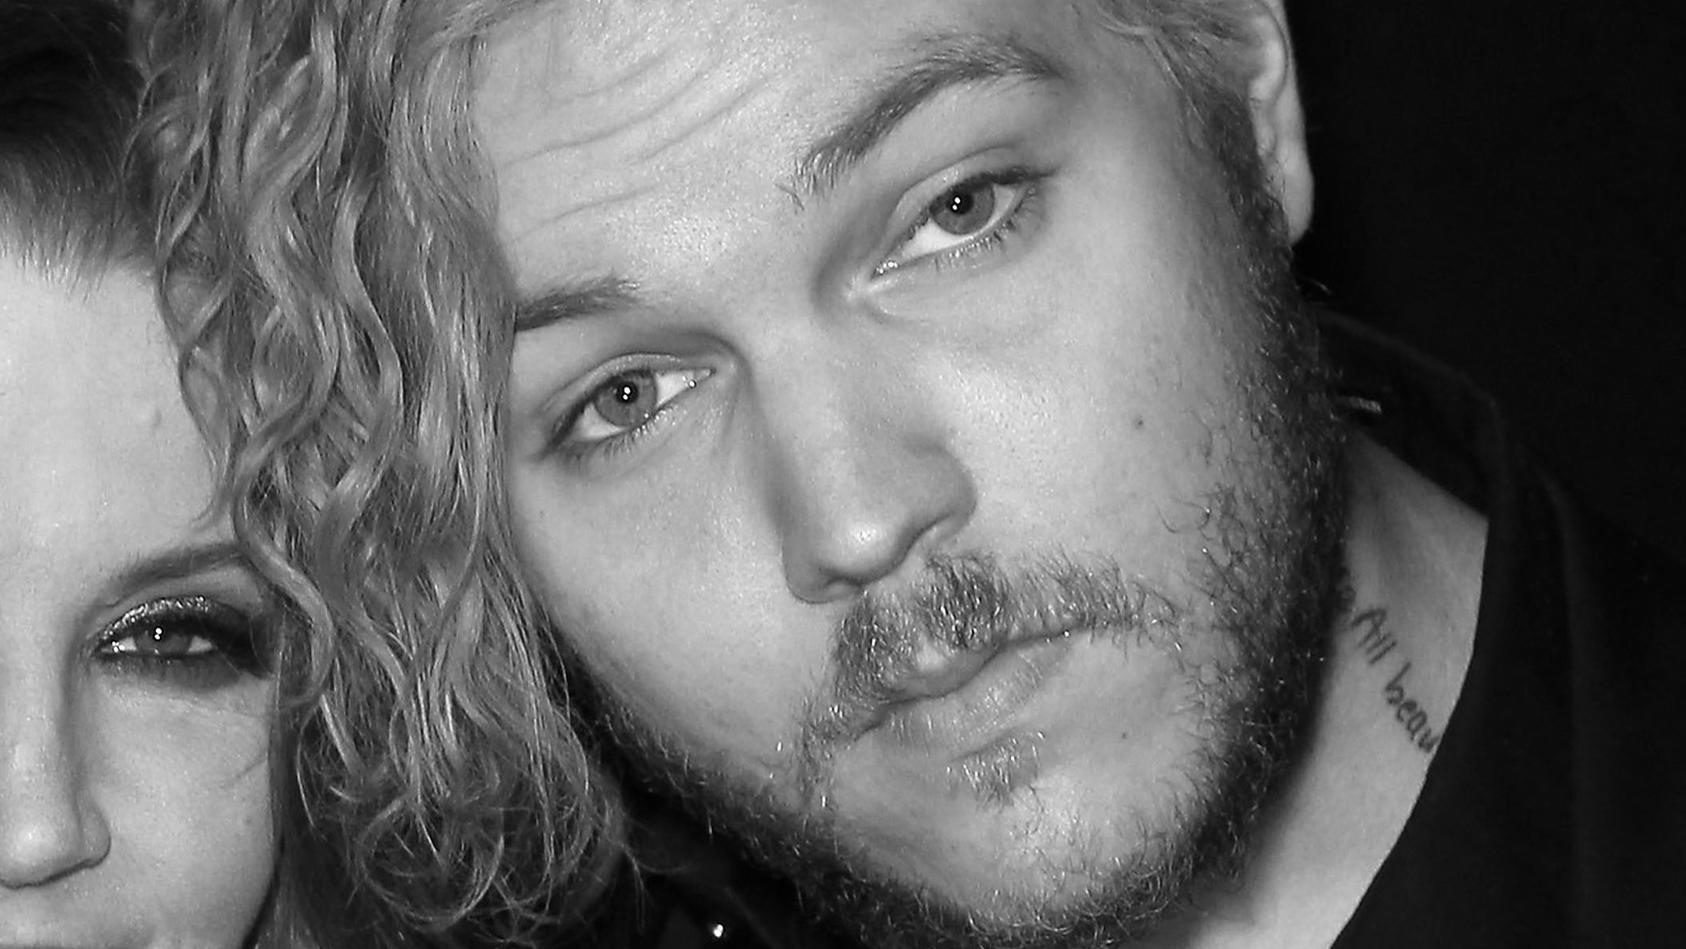 Benjamin Keough, der Sohn von Lisa Marie Presley, starb am 12. Juli 2020.